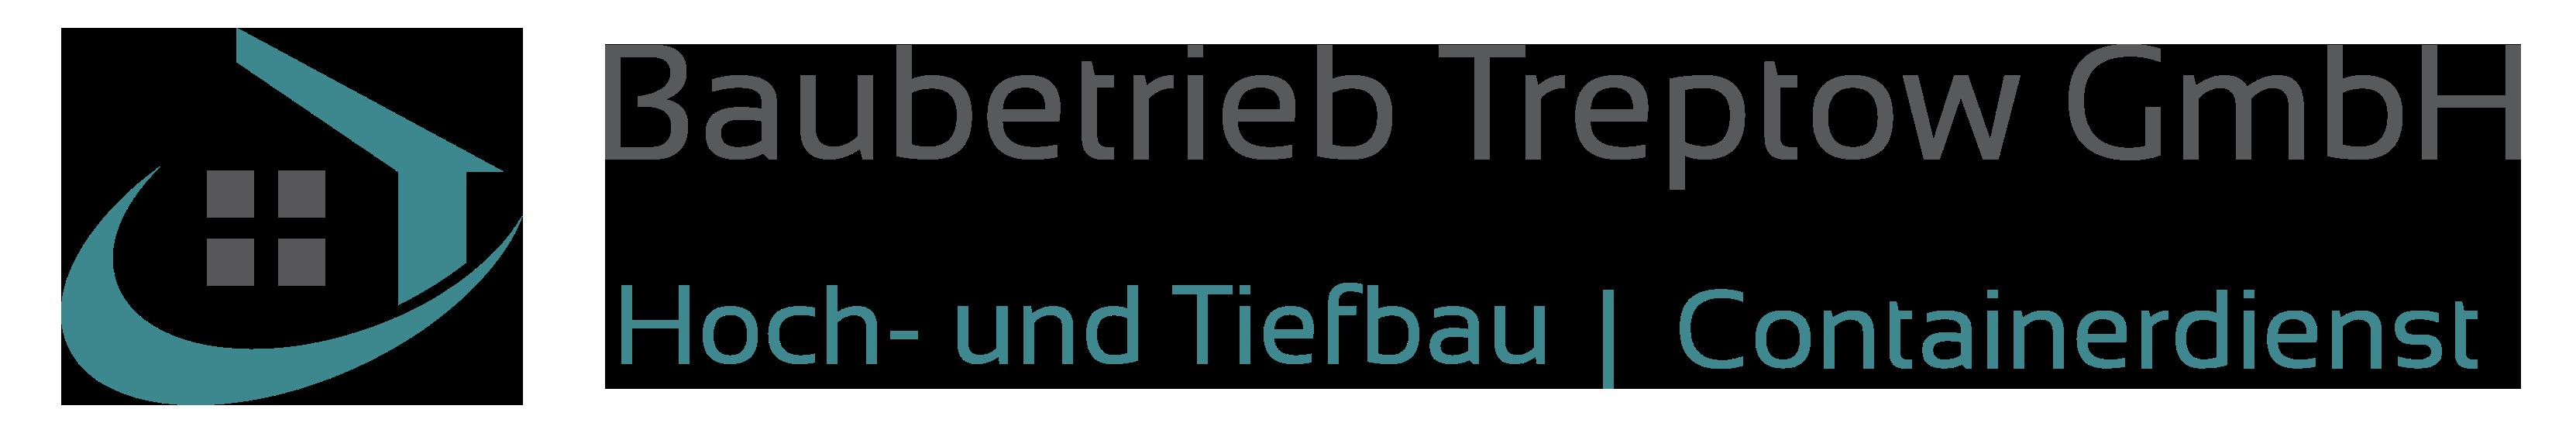 Baubetrieb Treptow GmbH